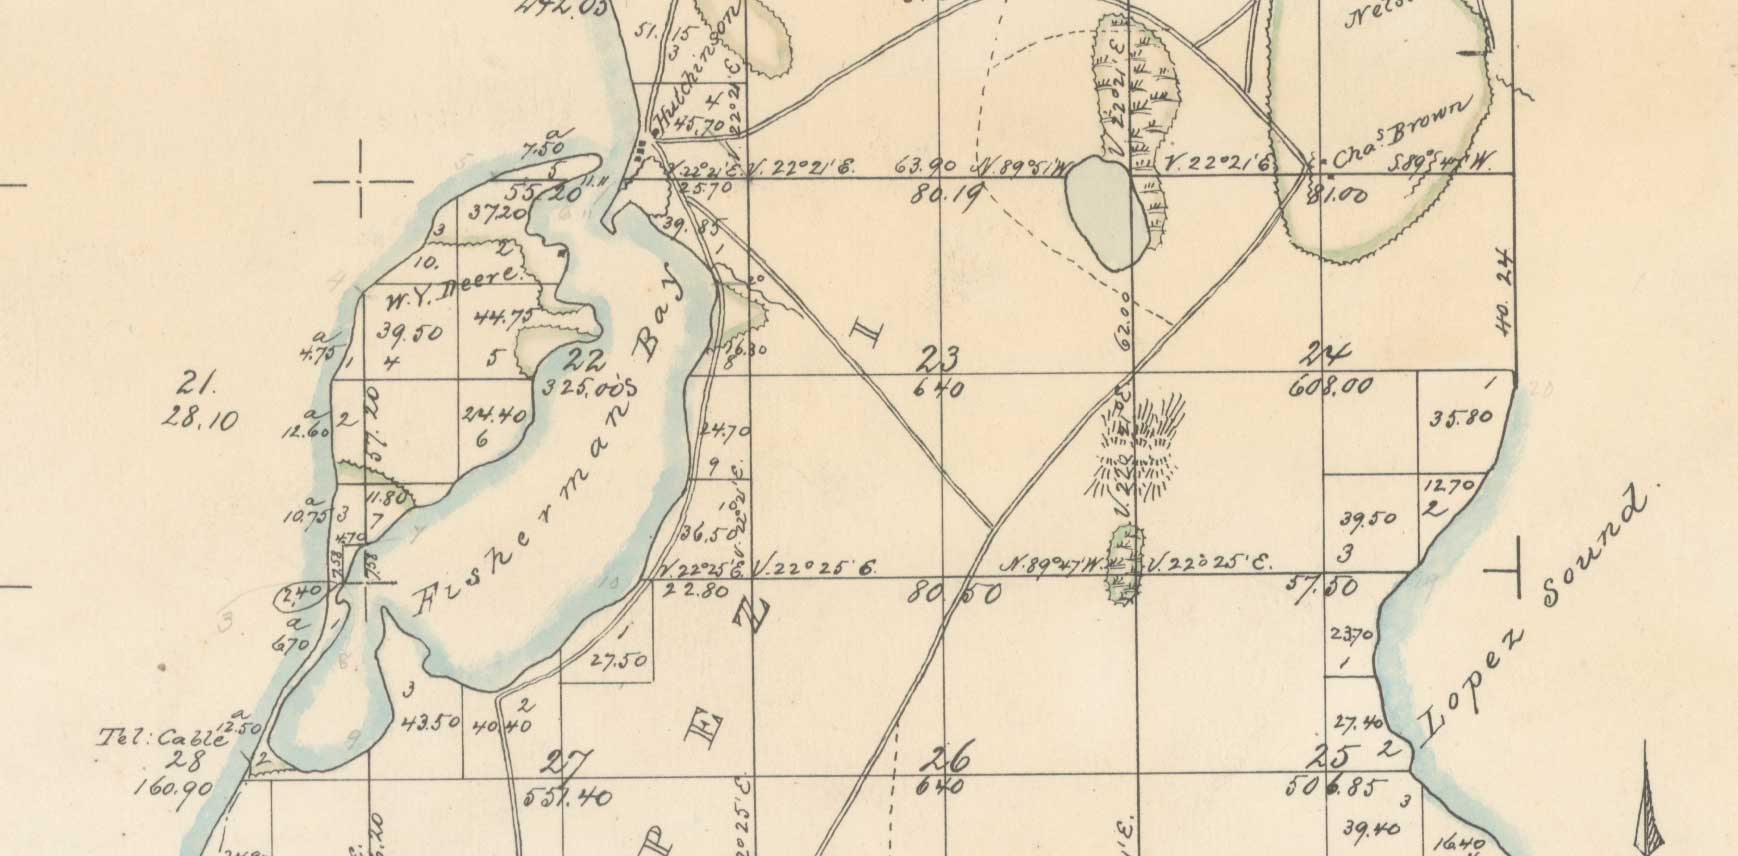 1874 Survey map (detail)